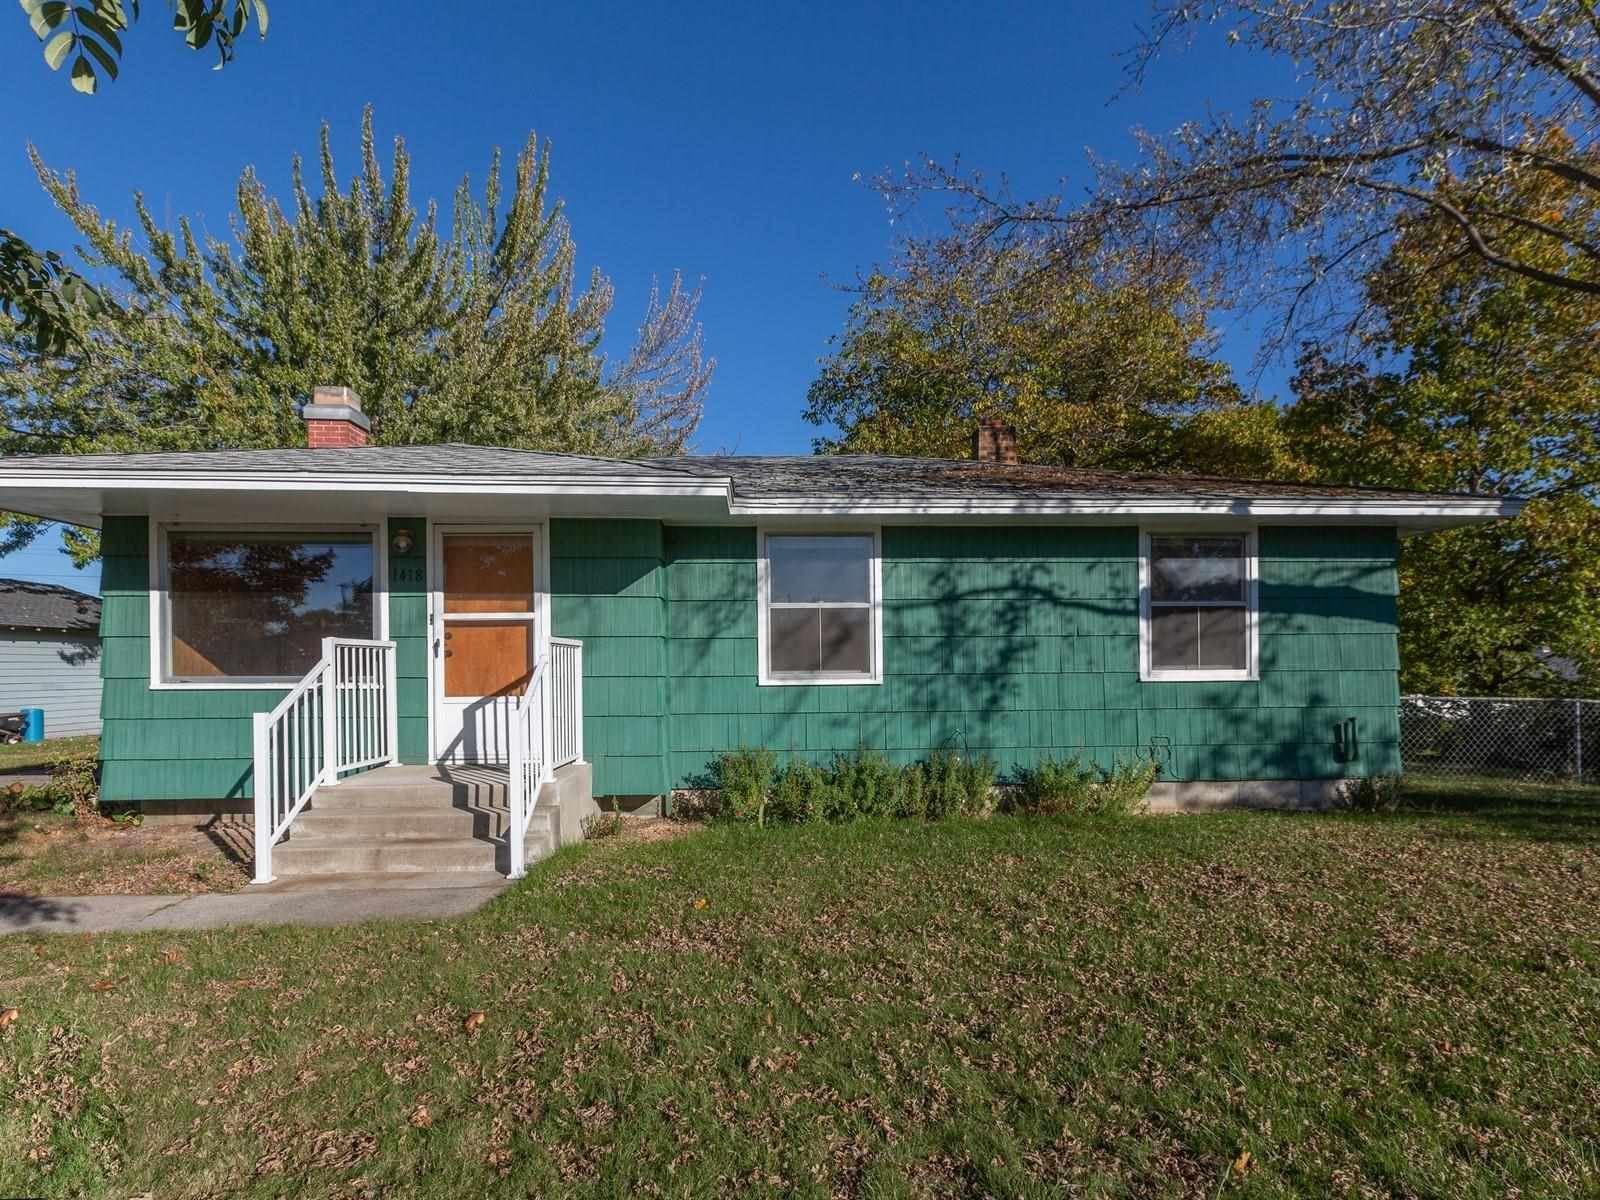 1418 N Lewis Rd, Spokane Valley, WA 99212 - #: 202123804